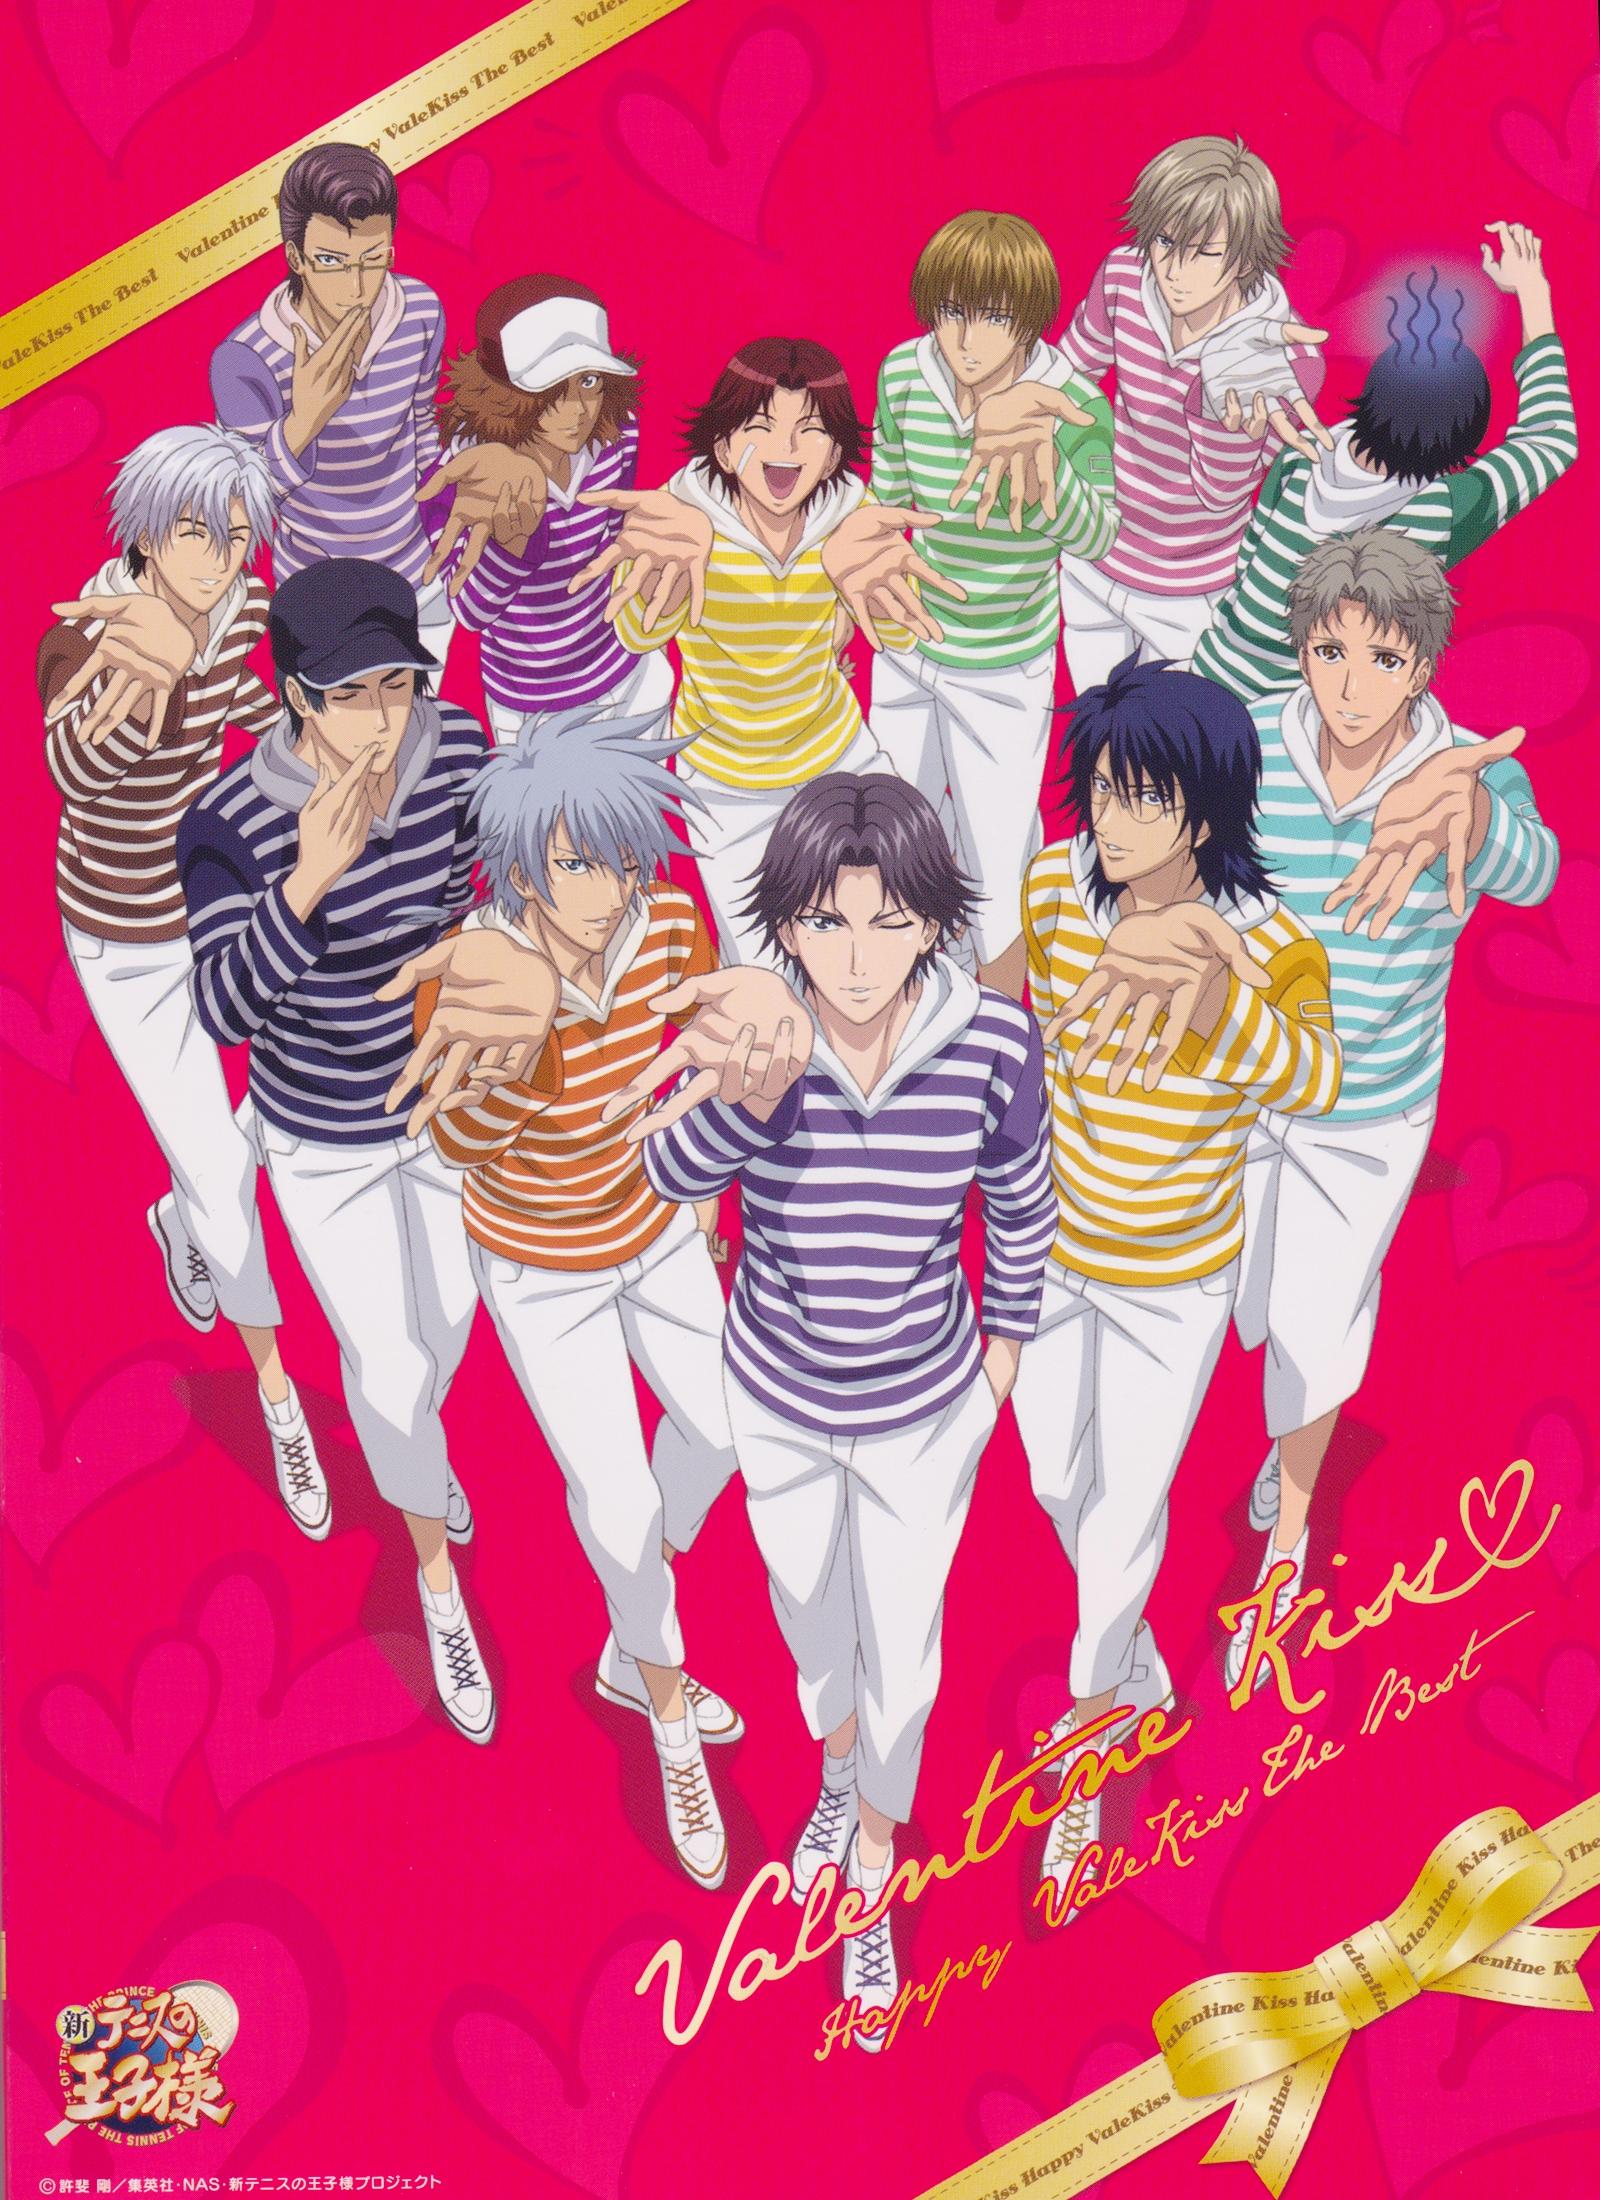 Tags Anime Konomi Takeshi New Prince Of Tennis No Ouji